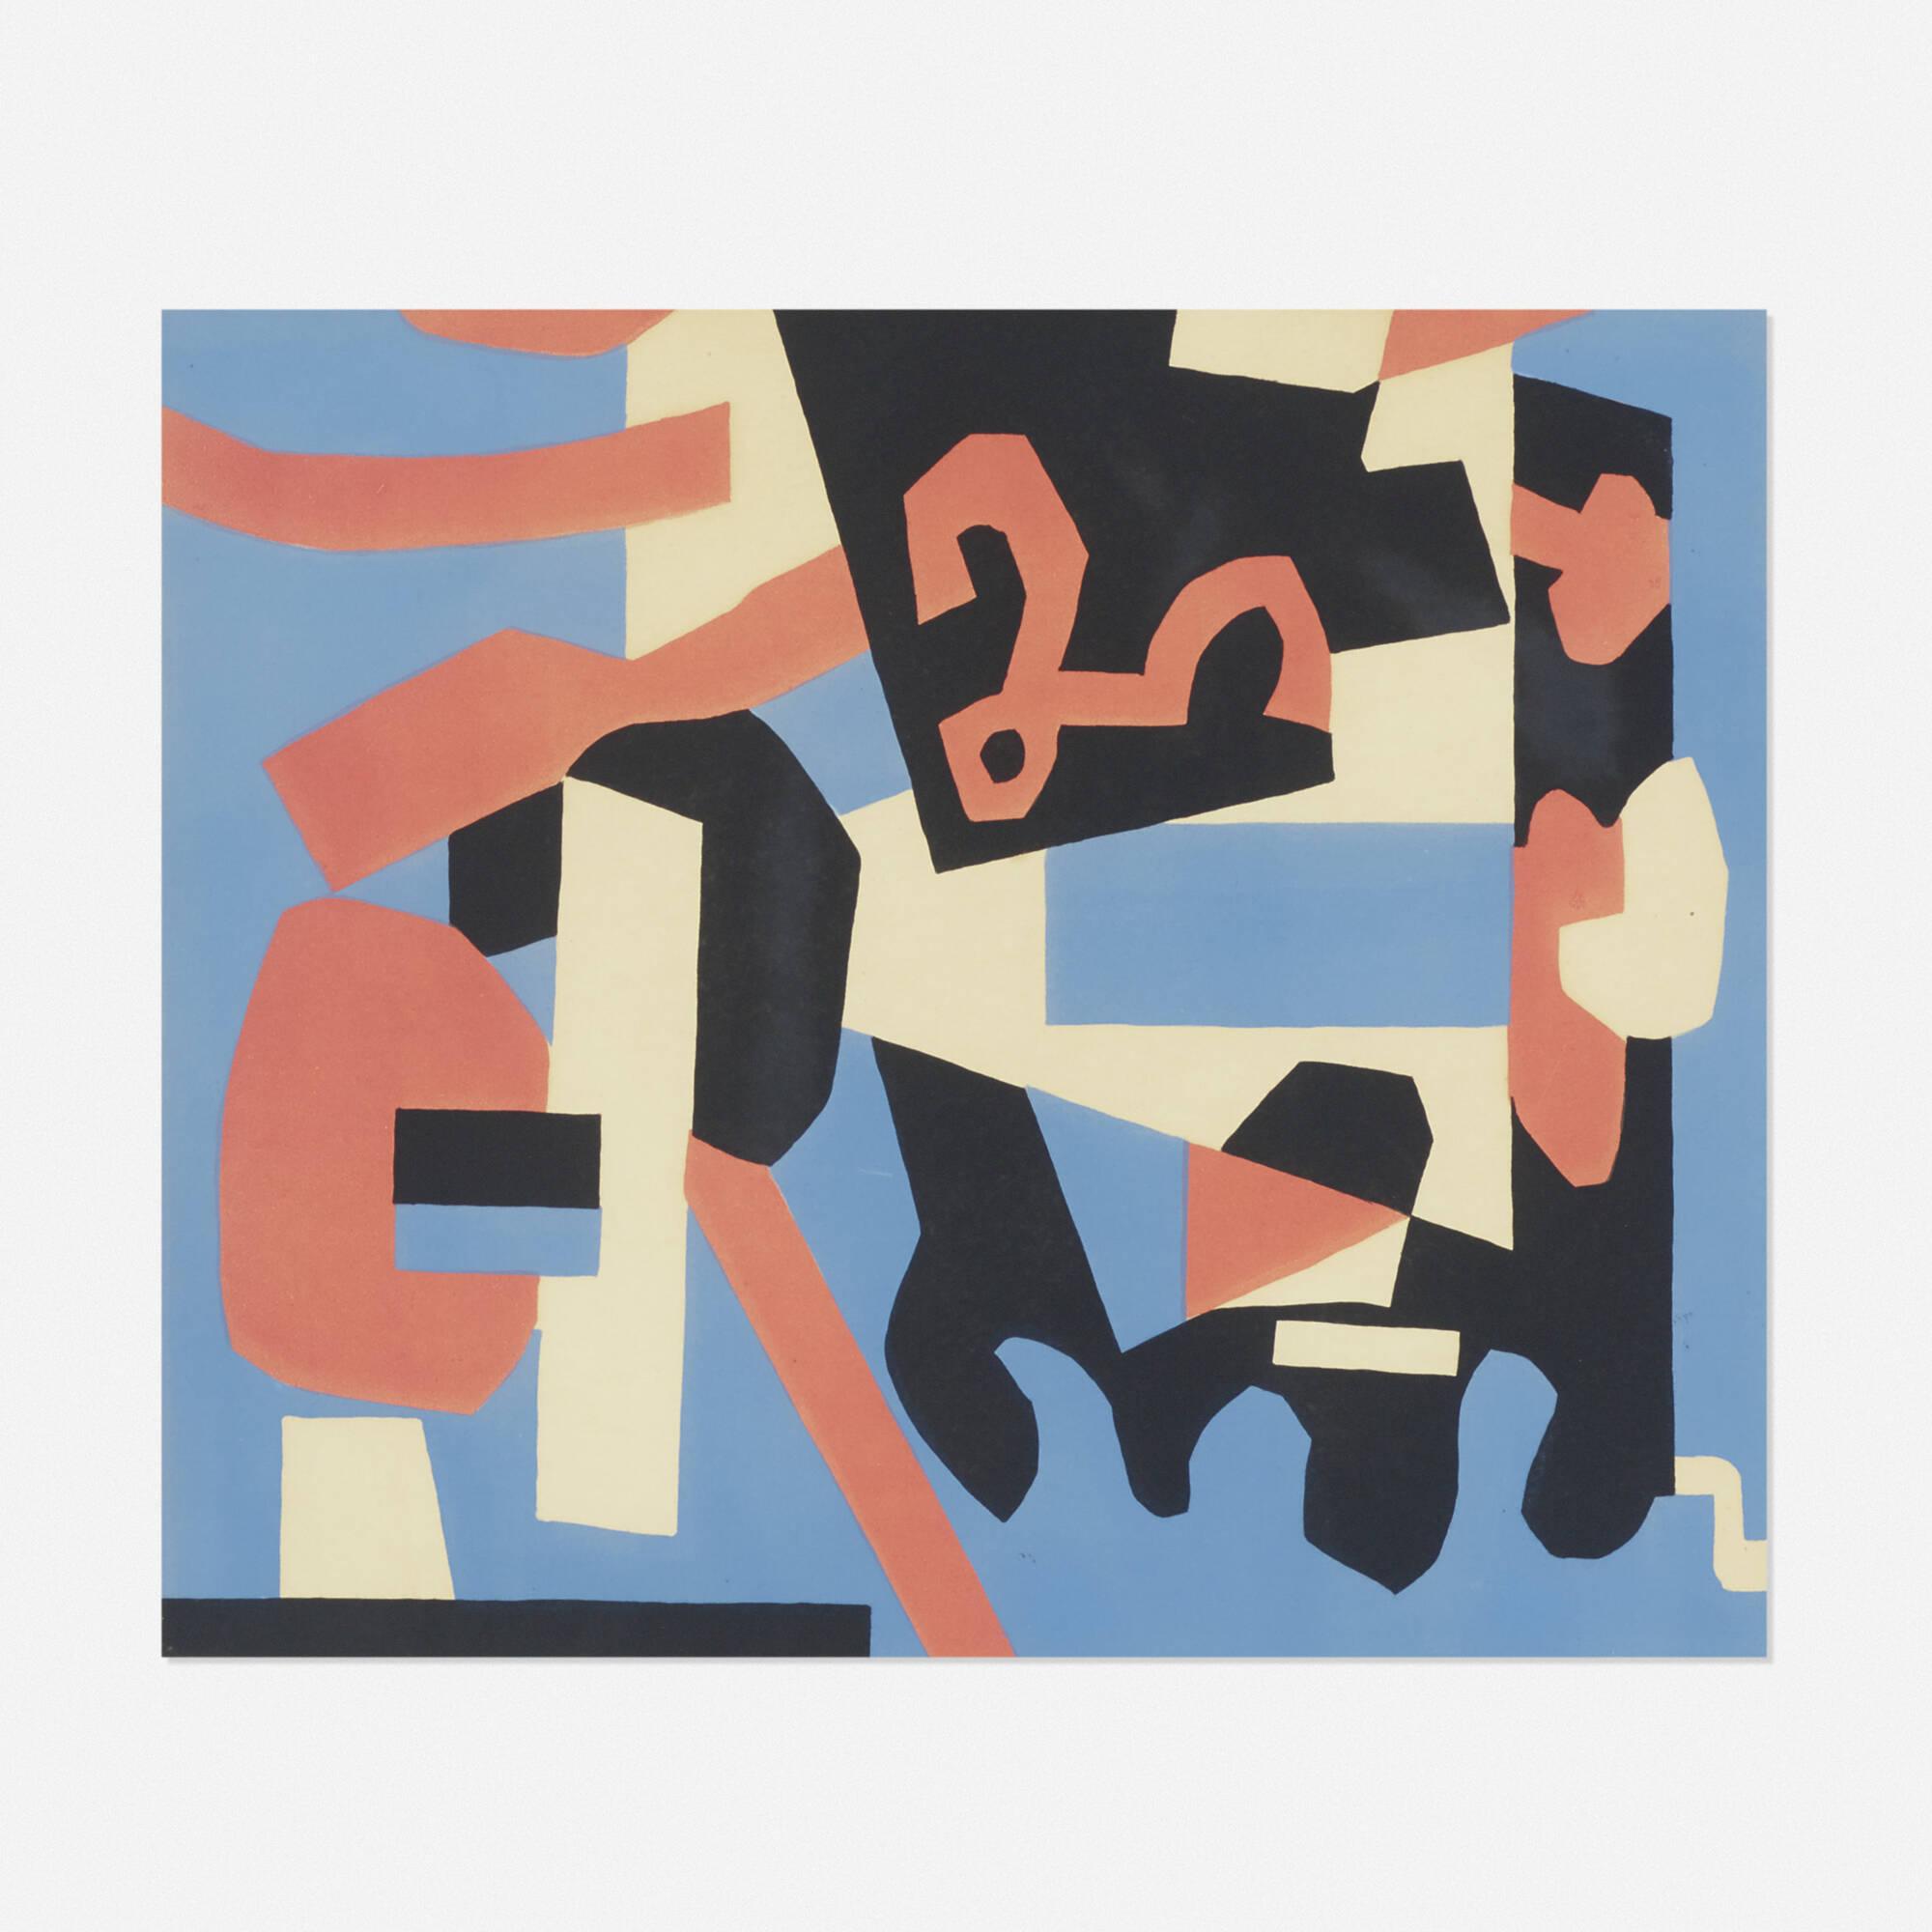 110: Stuart Davis / Detail Study for Cliché (1 of 1)